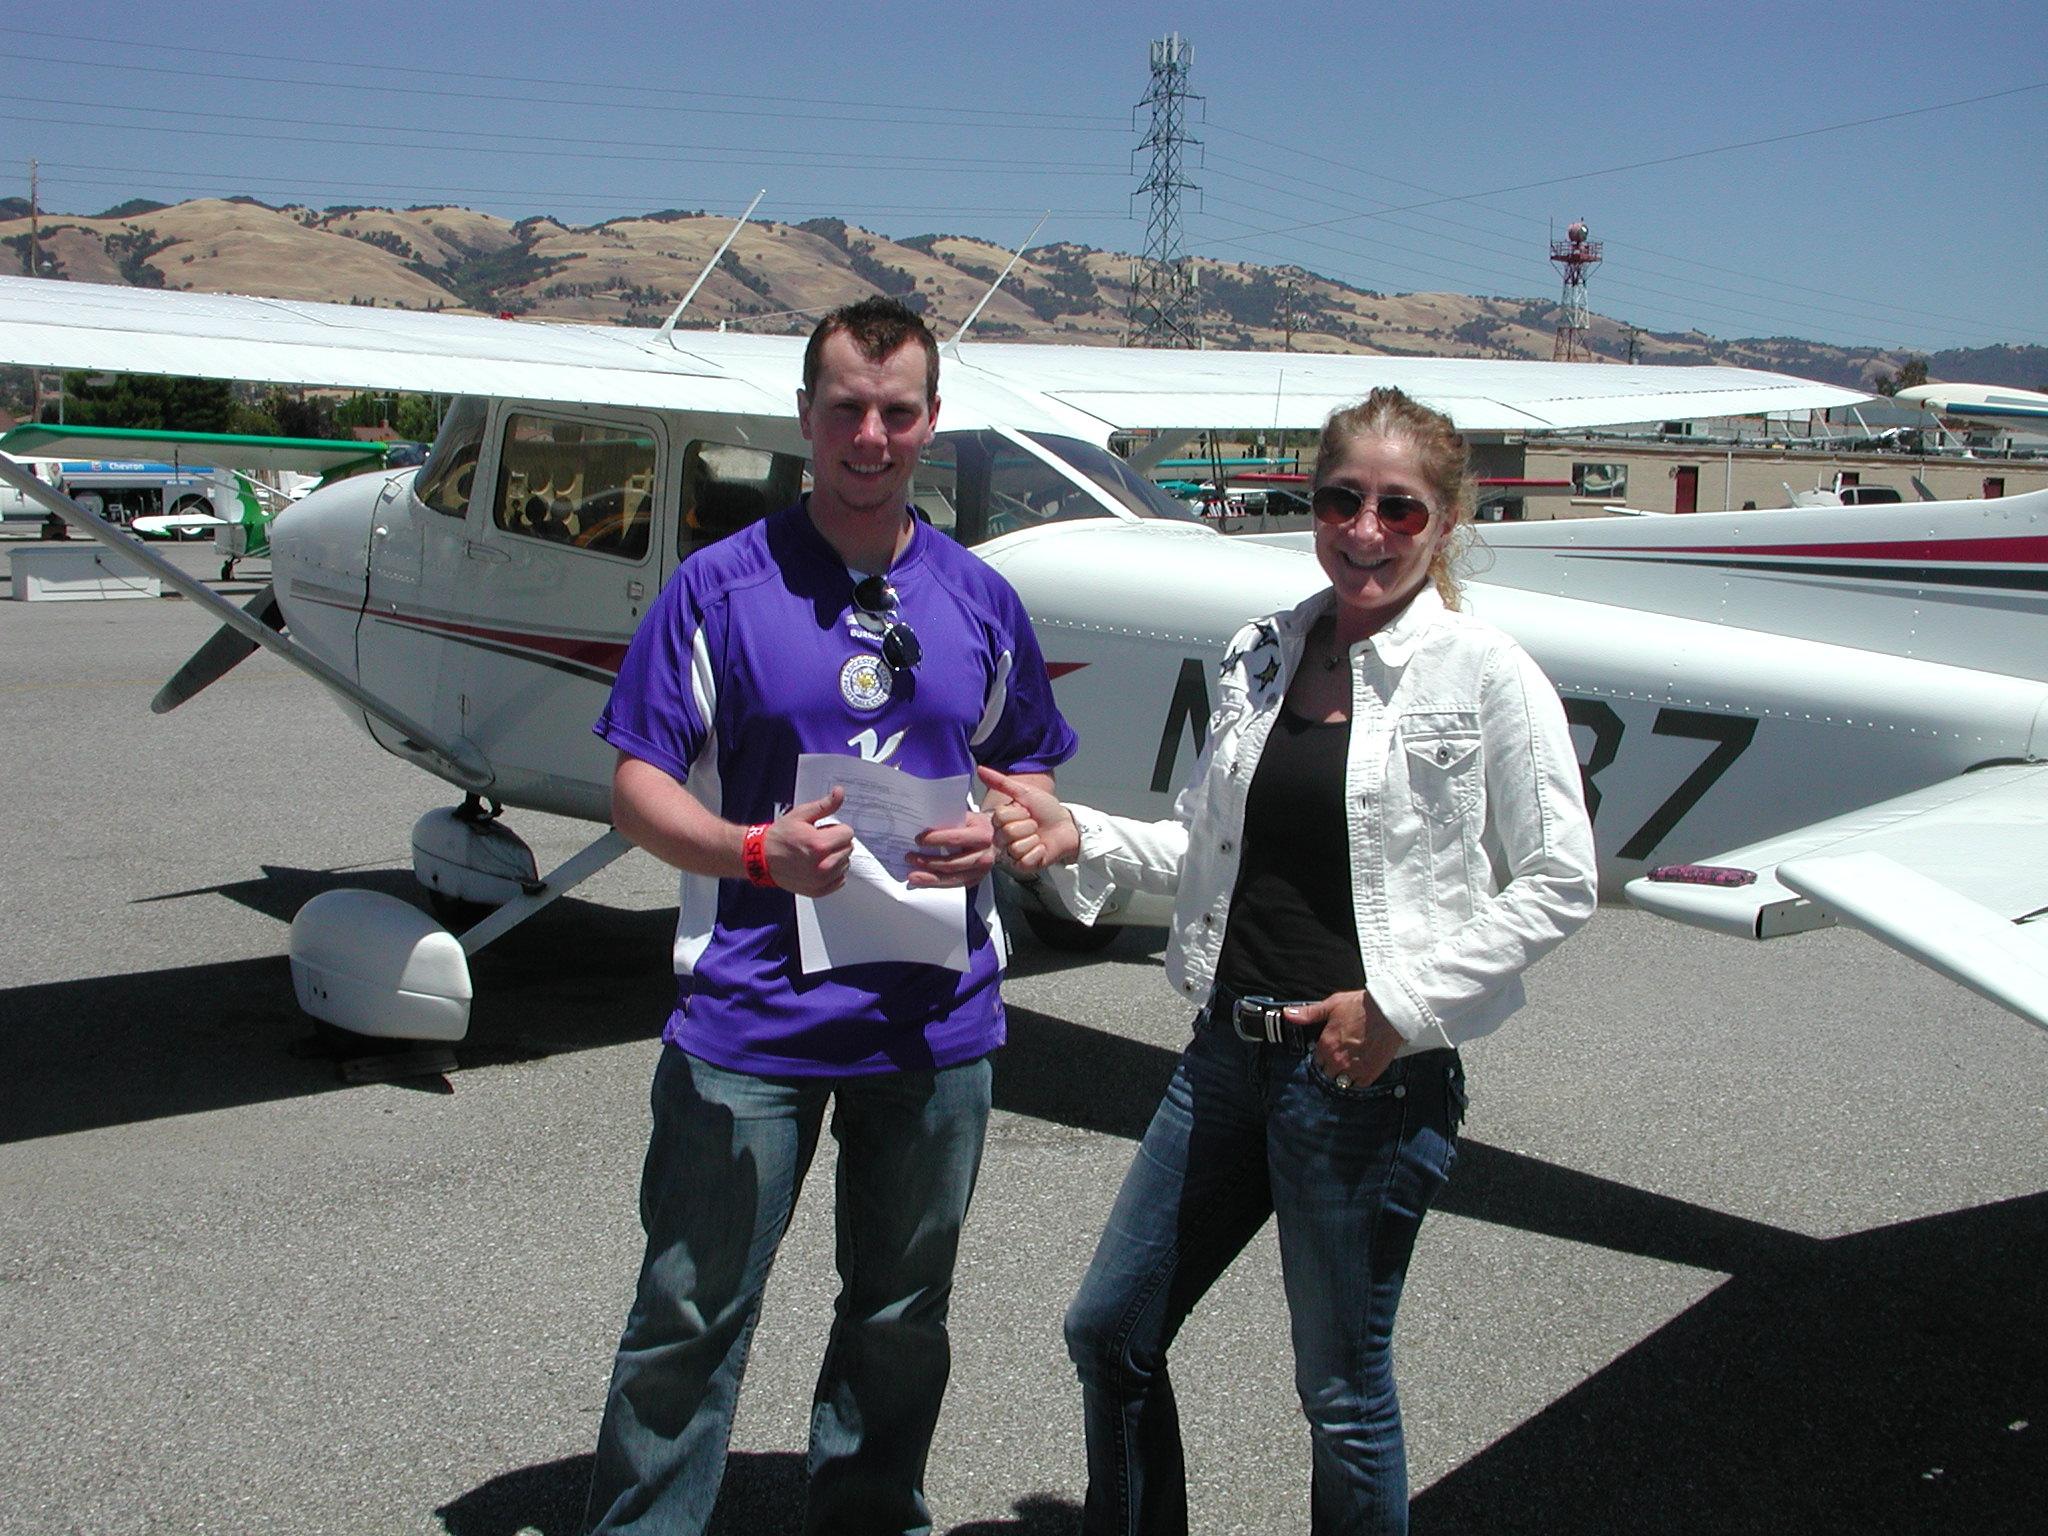 Jim Crawford passes private pilot checkride in Cessna 172 at AeroDynamic Aviation located at Reid Hillview Airport in San Jose, CA